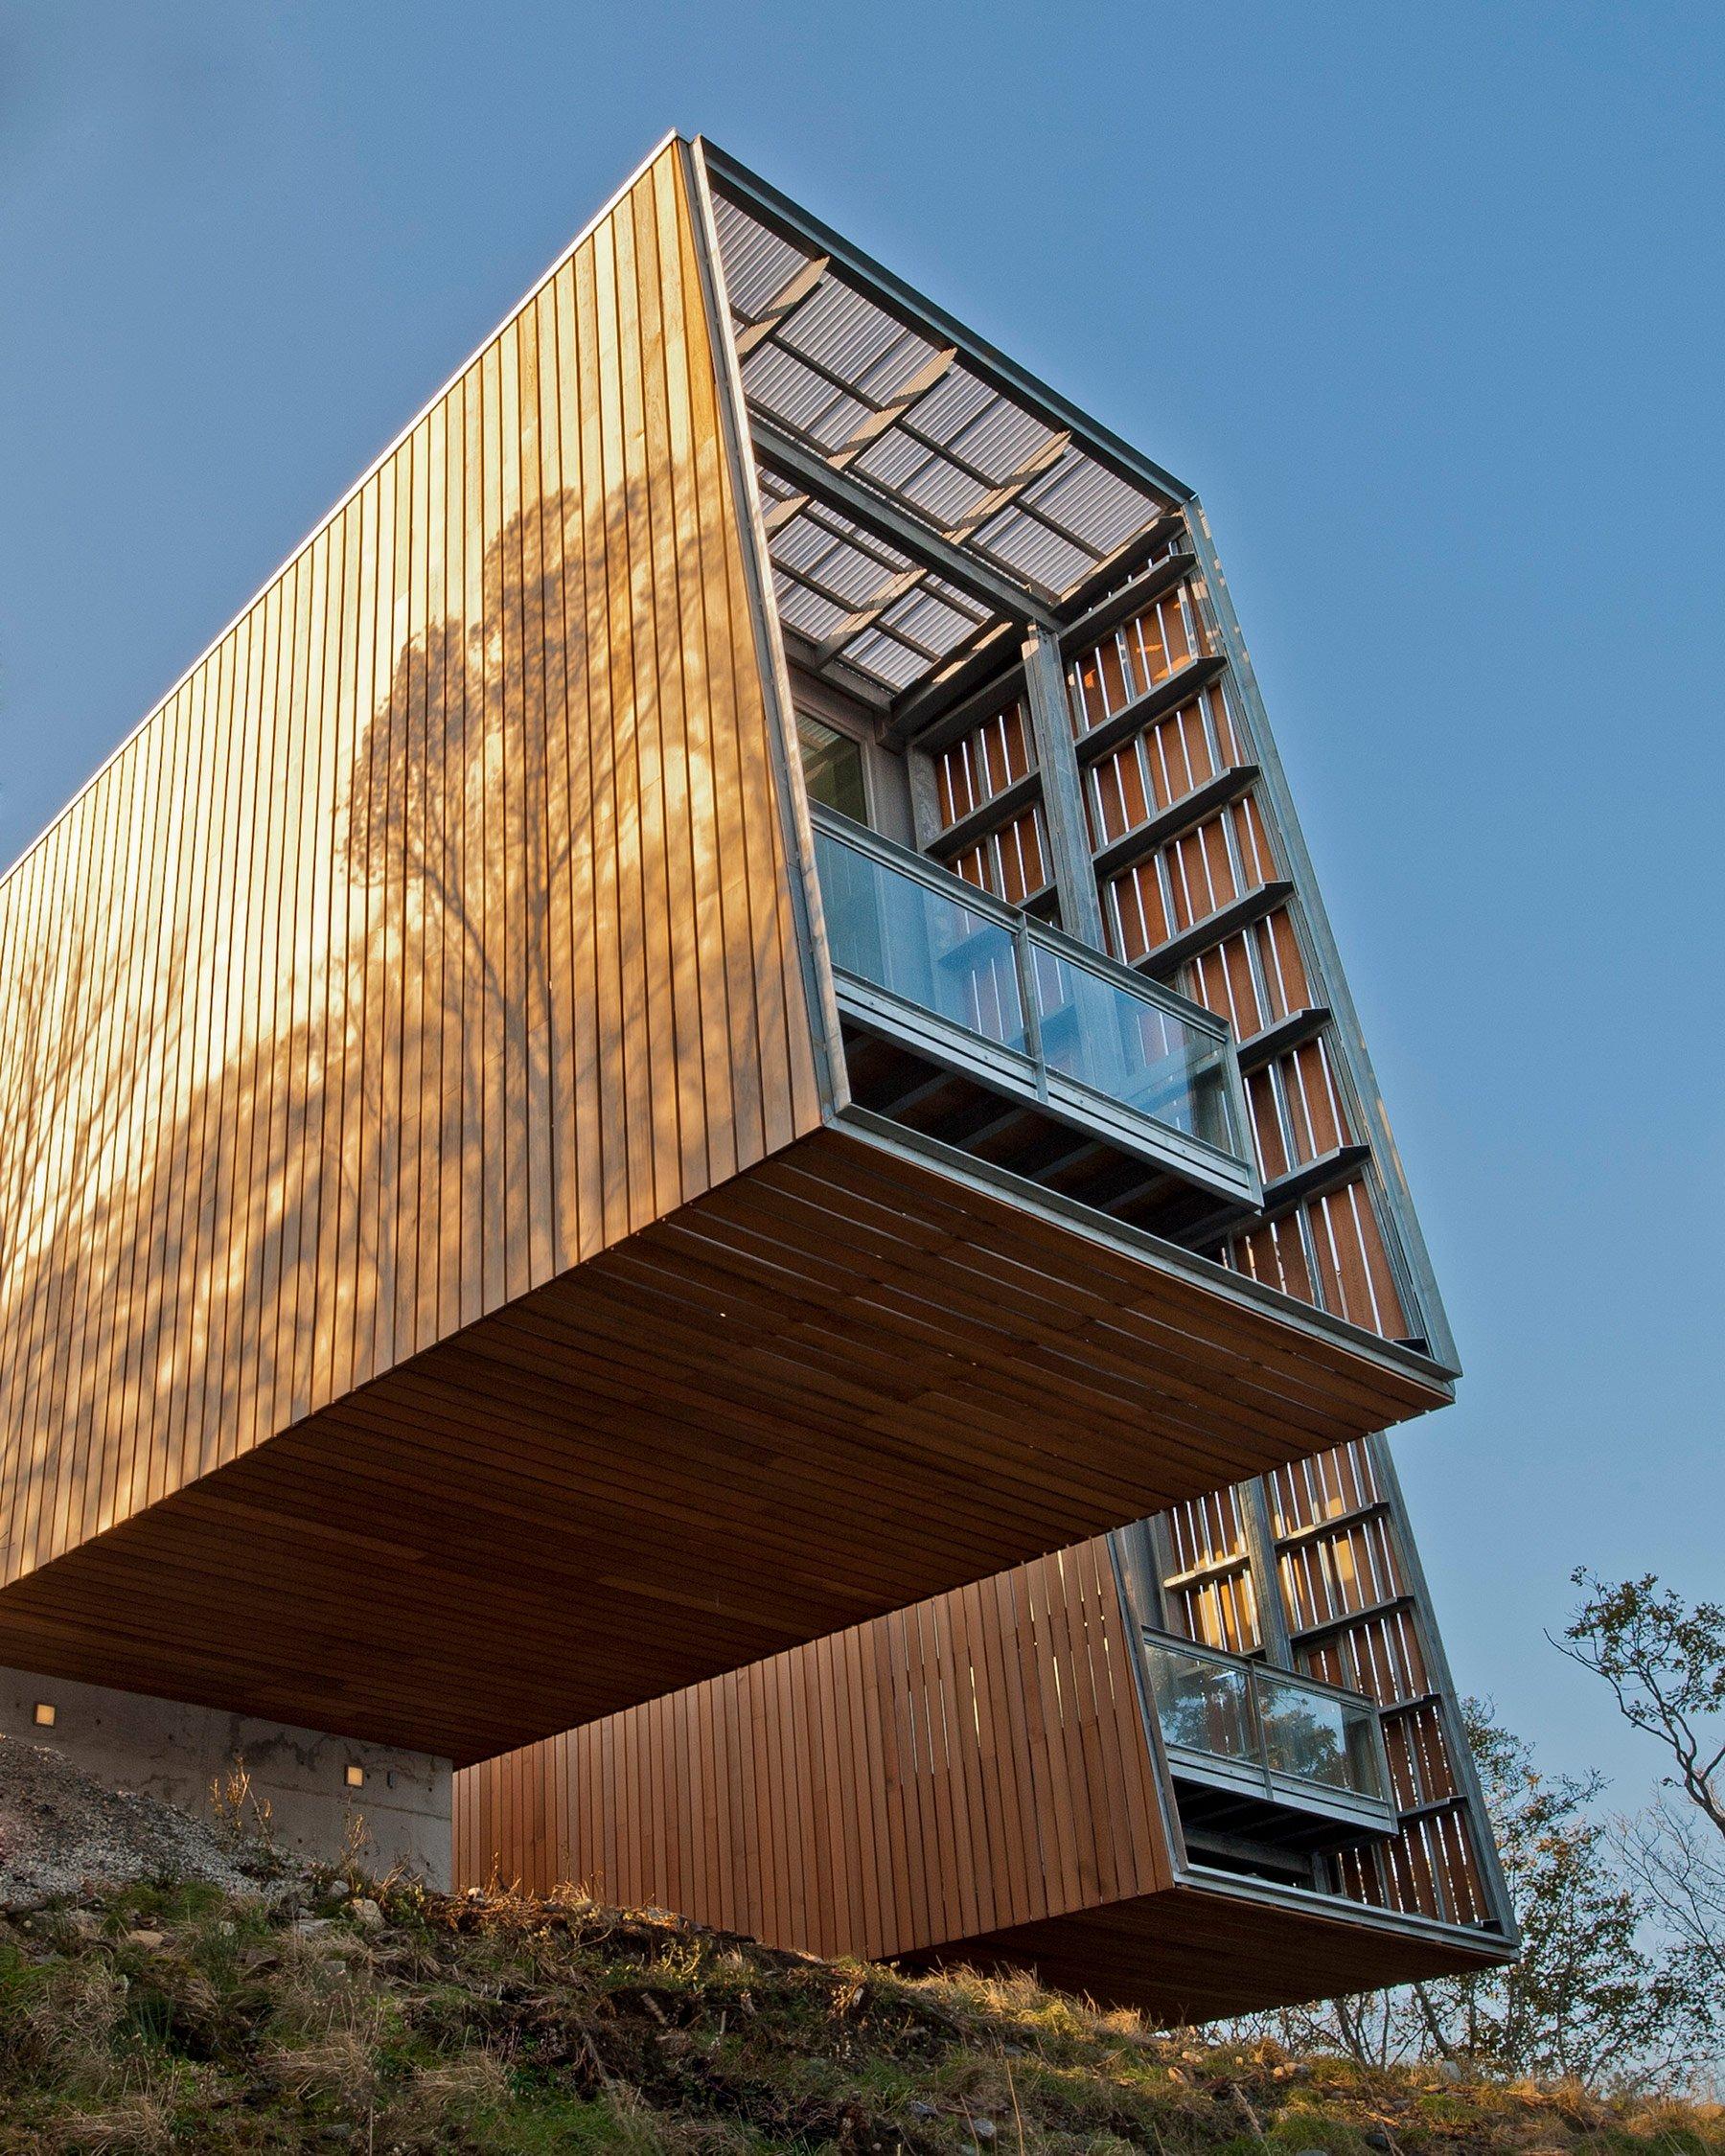 the-two-hulls-house-in-nova-scotia-canada-gessato-3